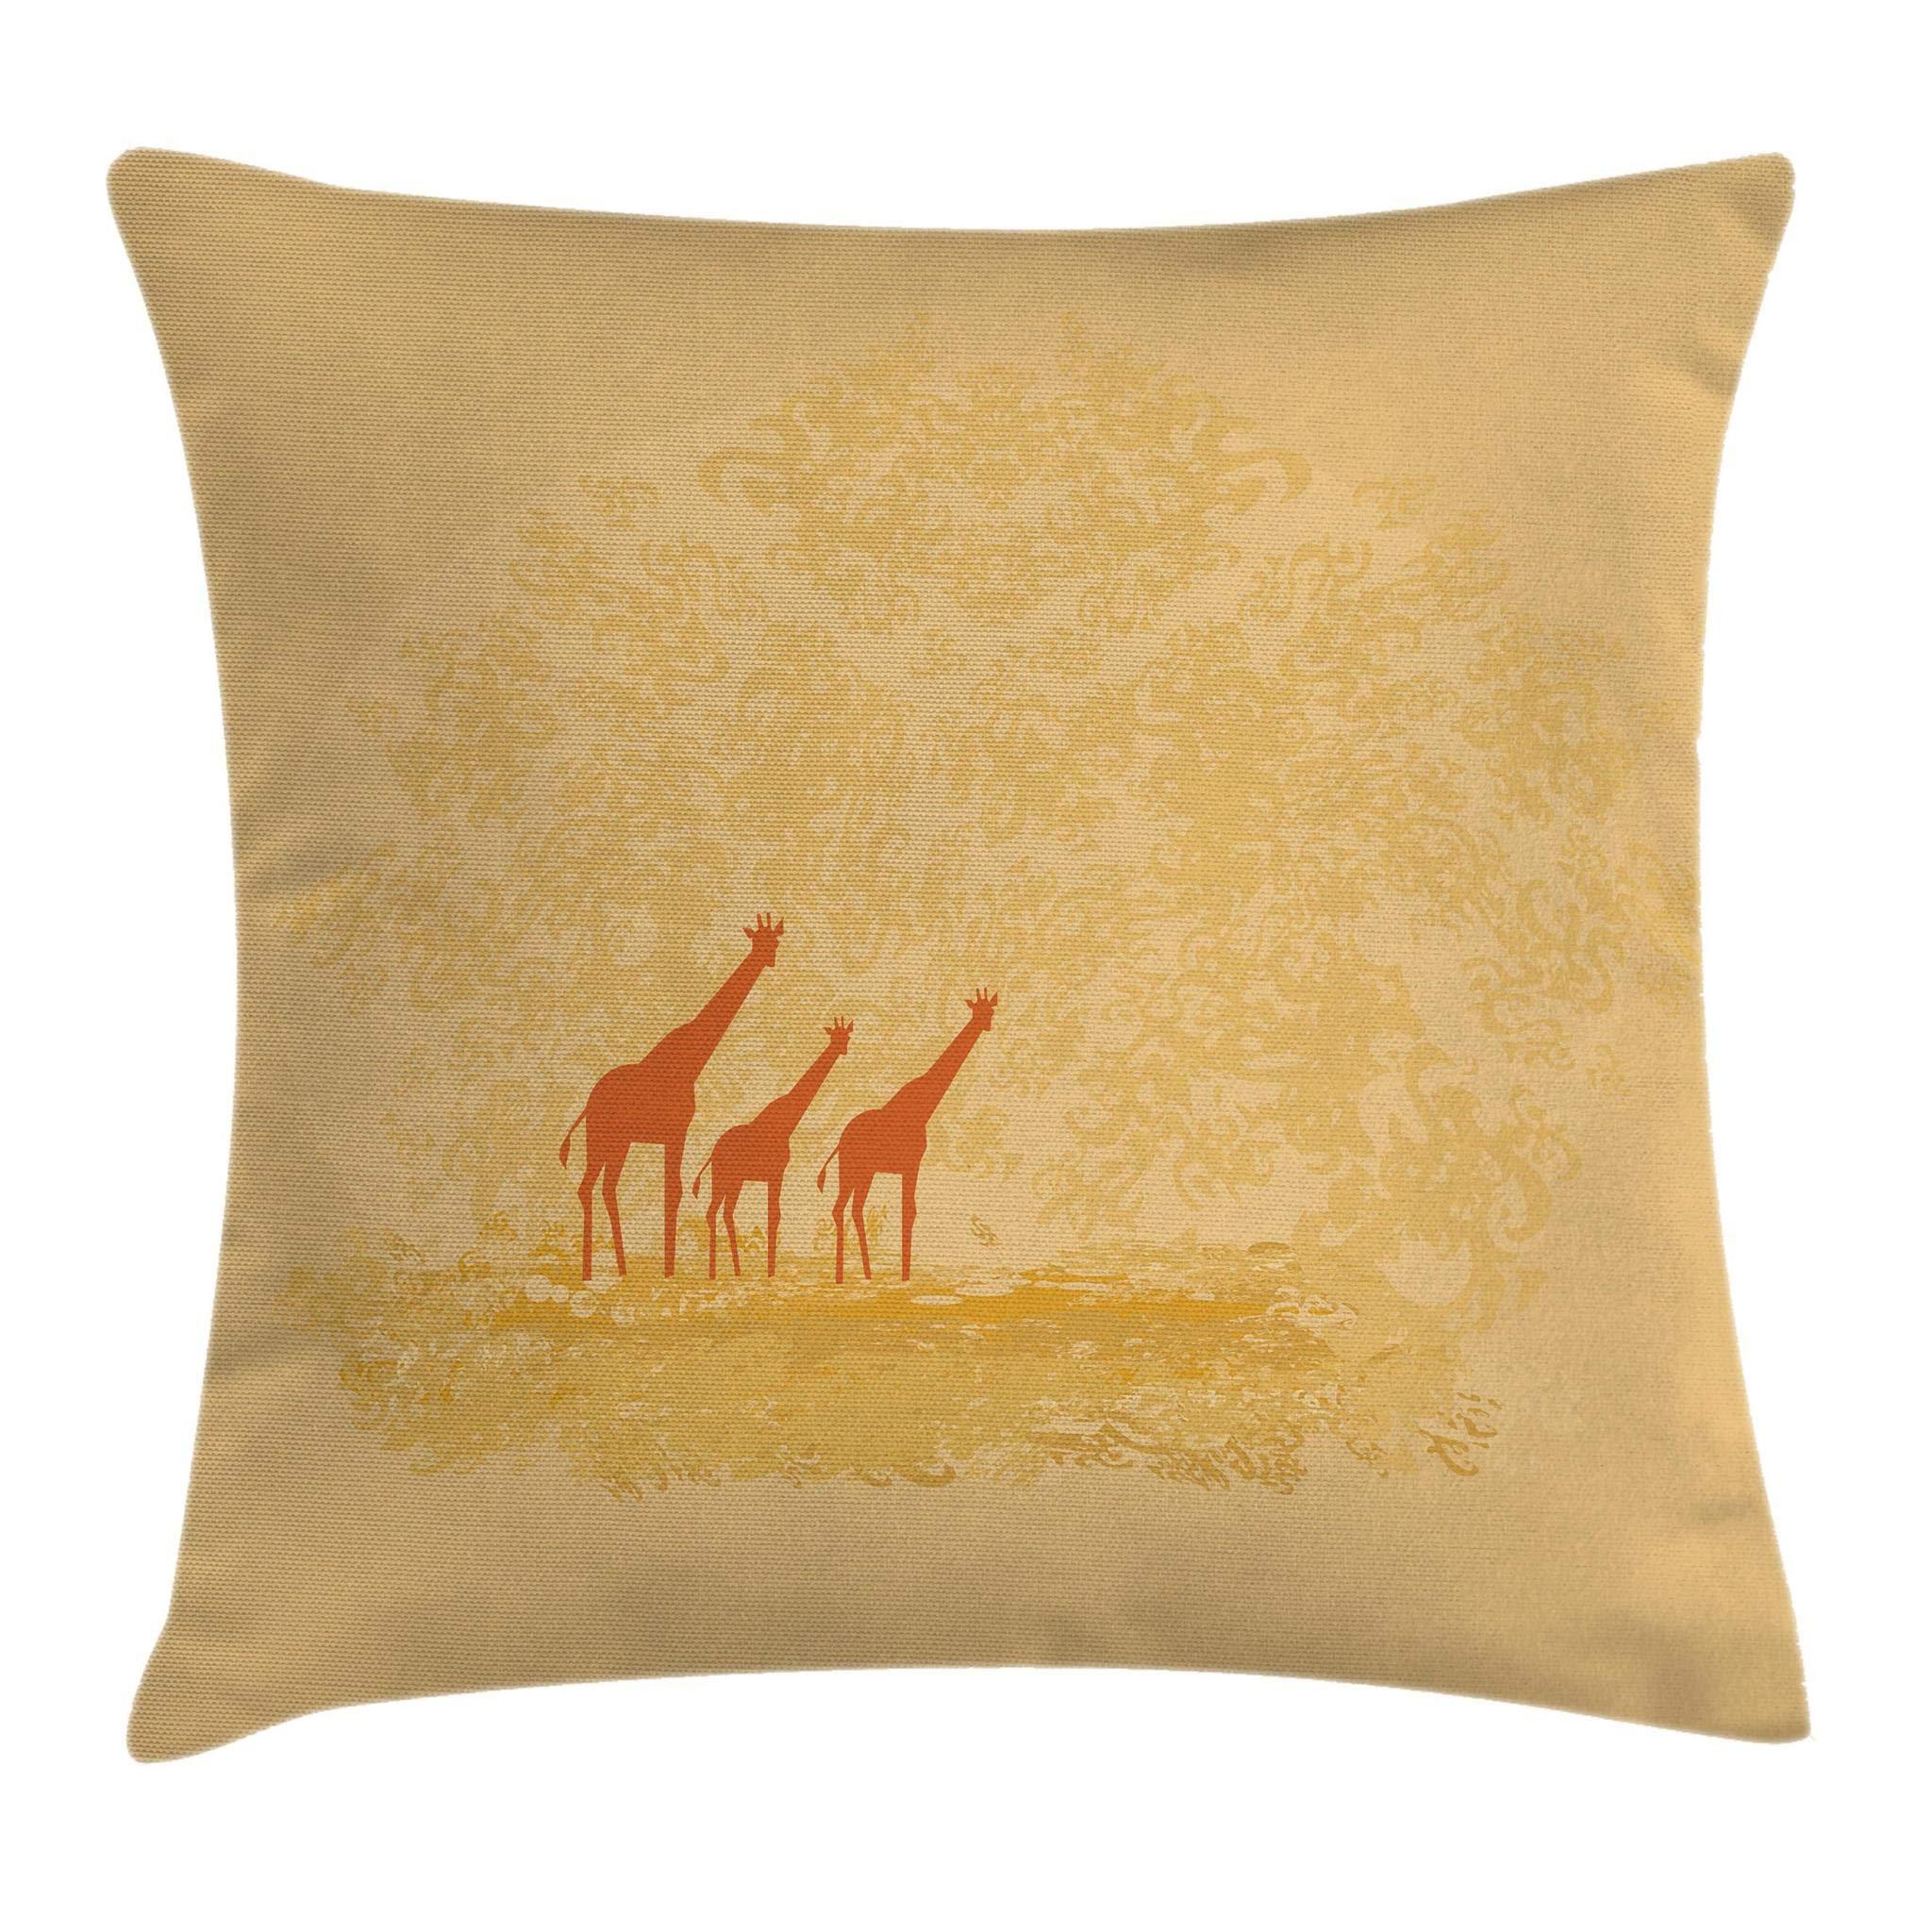 Ambesonne Giraffe Throw Pillow Cushion Cover, Giraffes in Retro Color Safari Savannah Design Hot Wild Life Animal Boho Scenery, Decorative Square Accent Pillow Case, 18'' X 18'', Cream Orange by Ambesonne